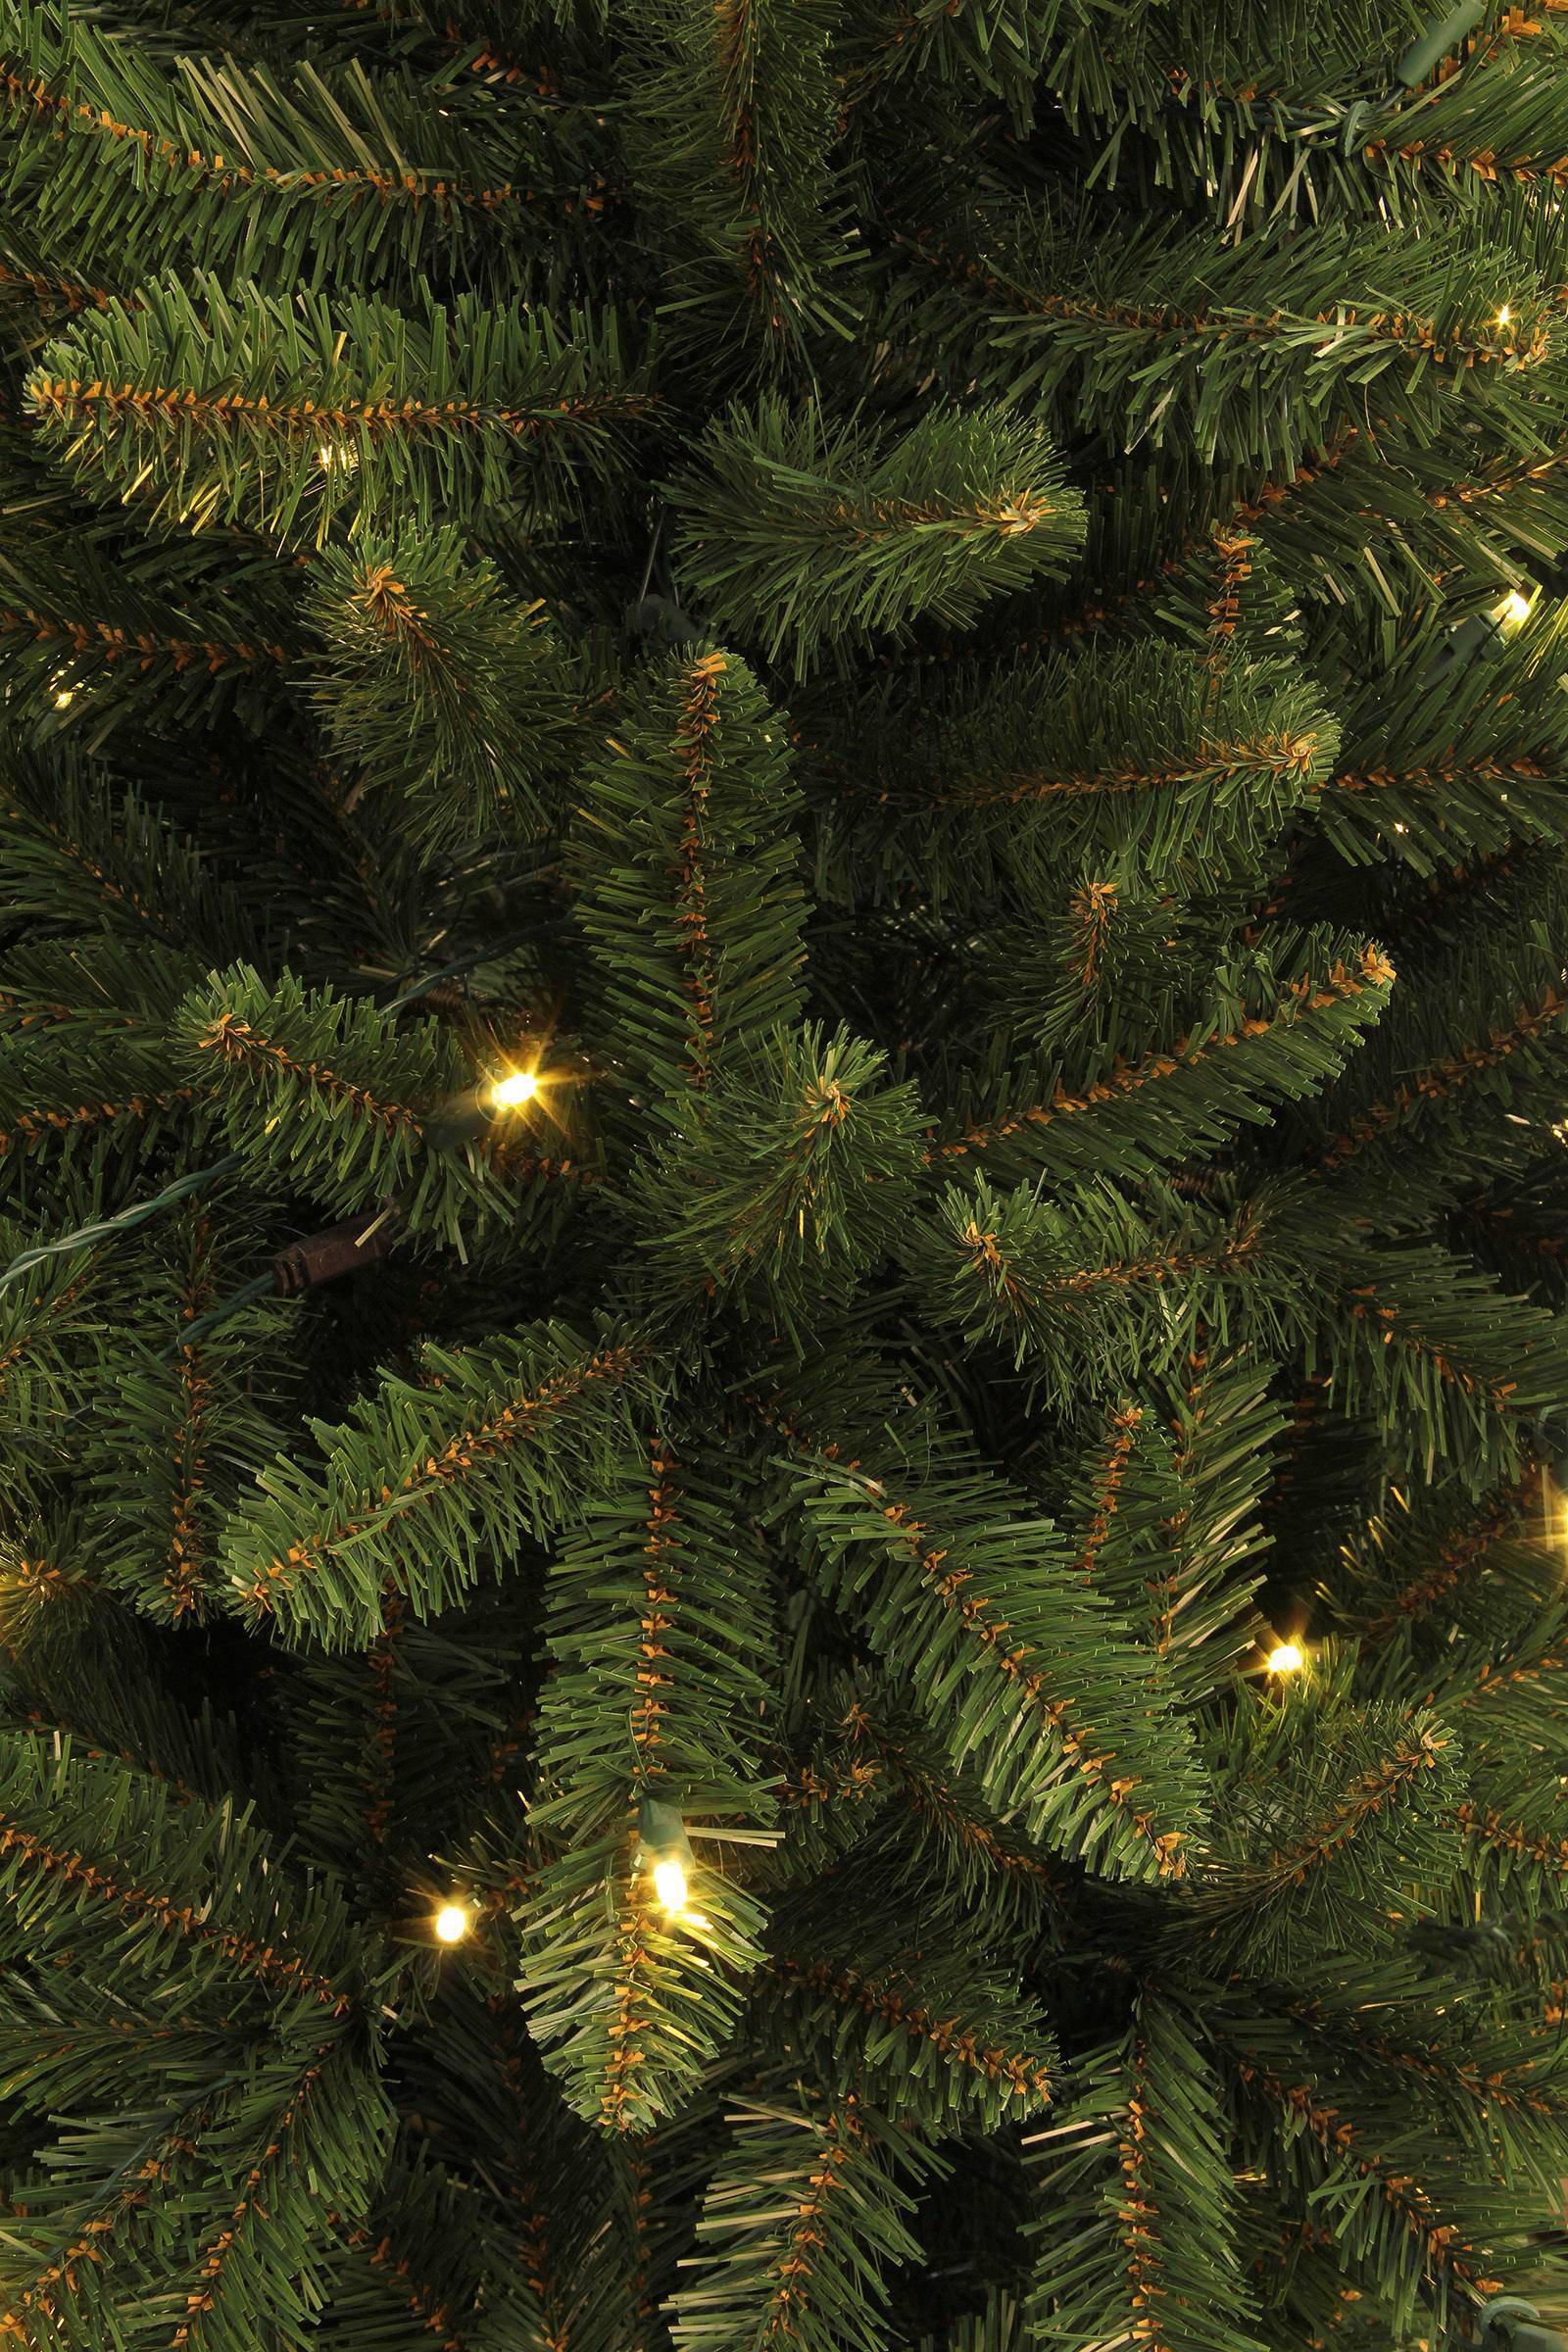 https://images.wehkamp.nl/i/wehkamp/531353_eb_02/black-box-kerstboom-led-185-x-101-cm-groen-8712799378148.jpg